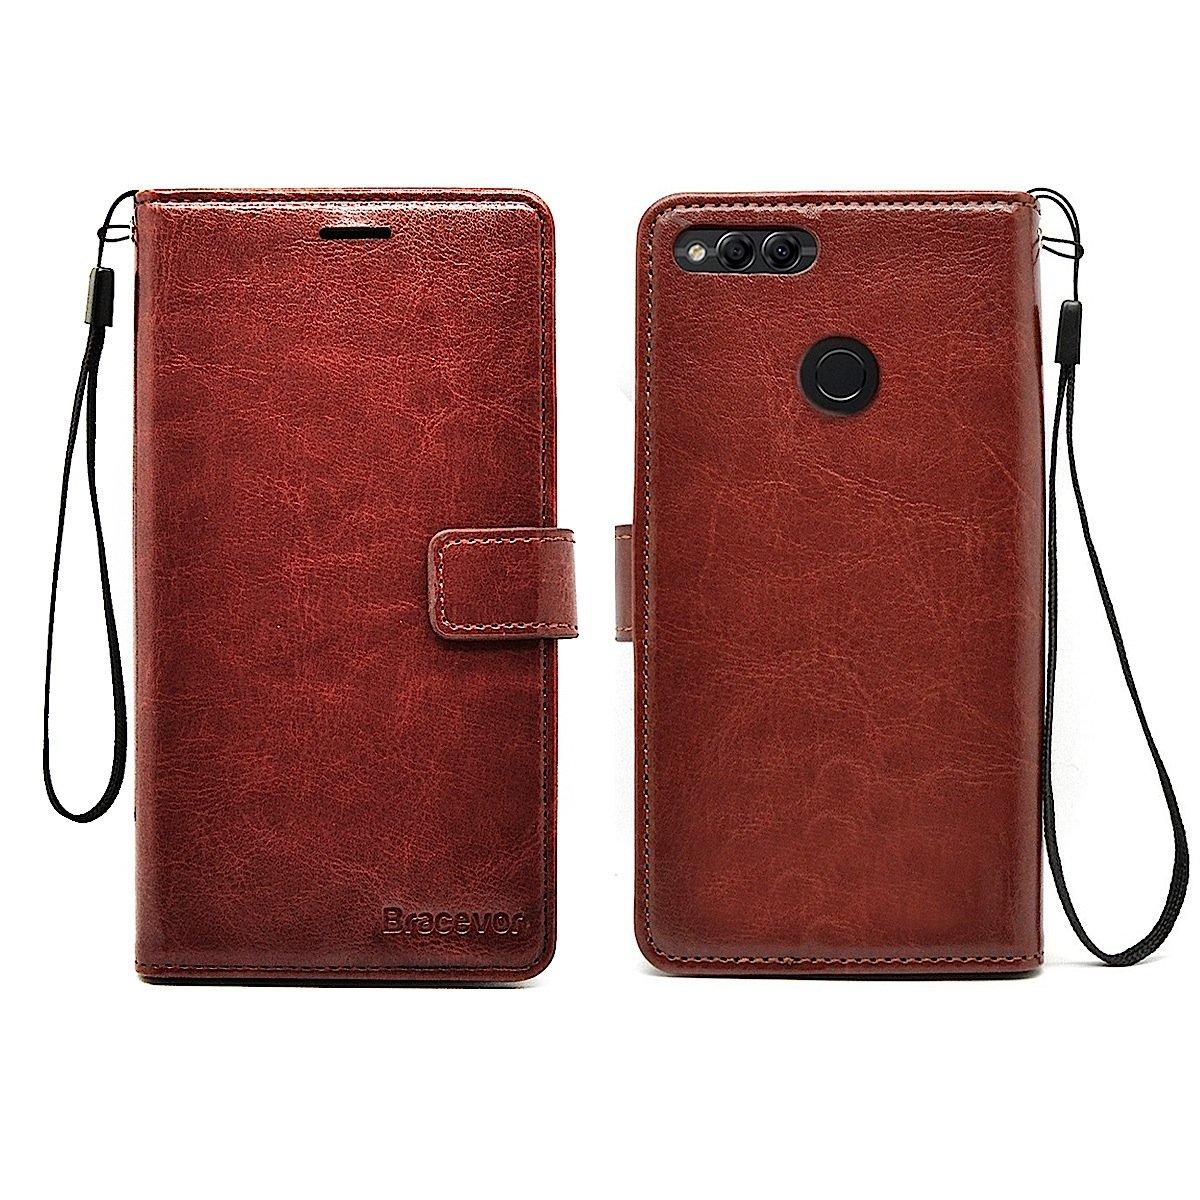 size 40 181ae bae2e Bracevor Inner TPU Leather Flip Cover Case for Huawei Honor 7X : -  Executive Brown